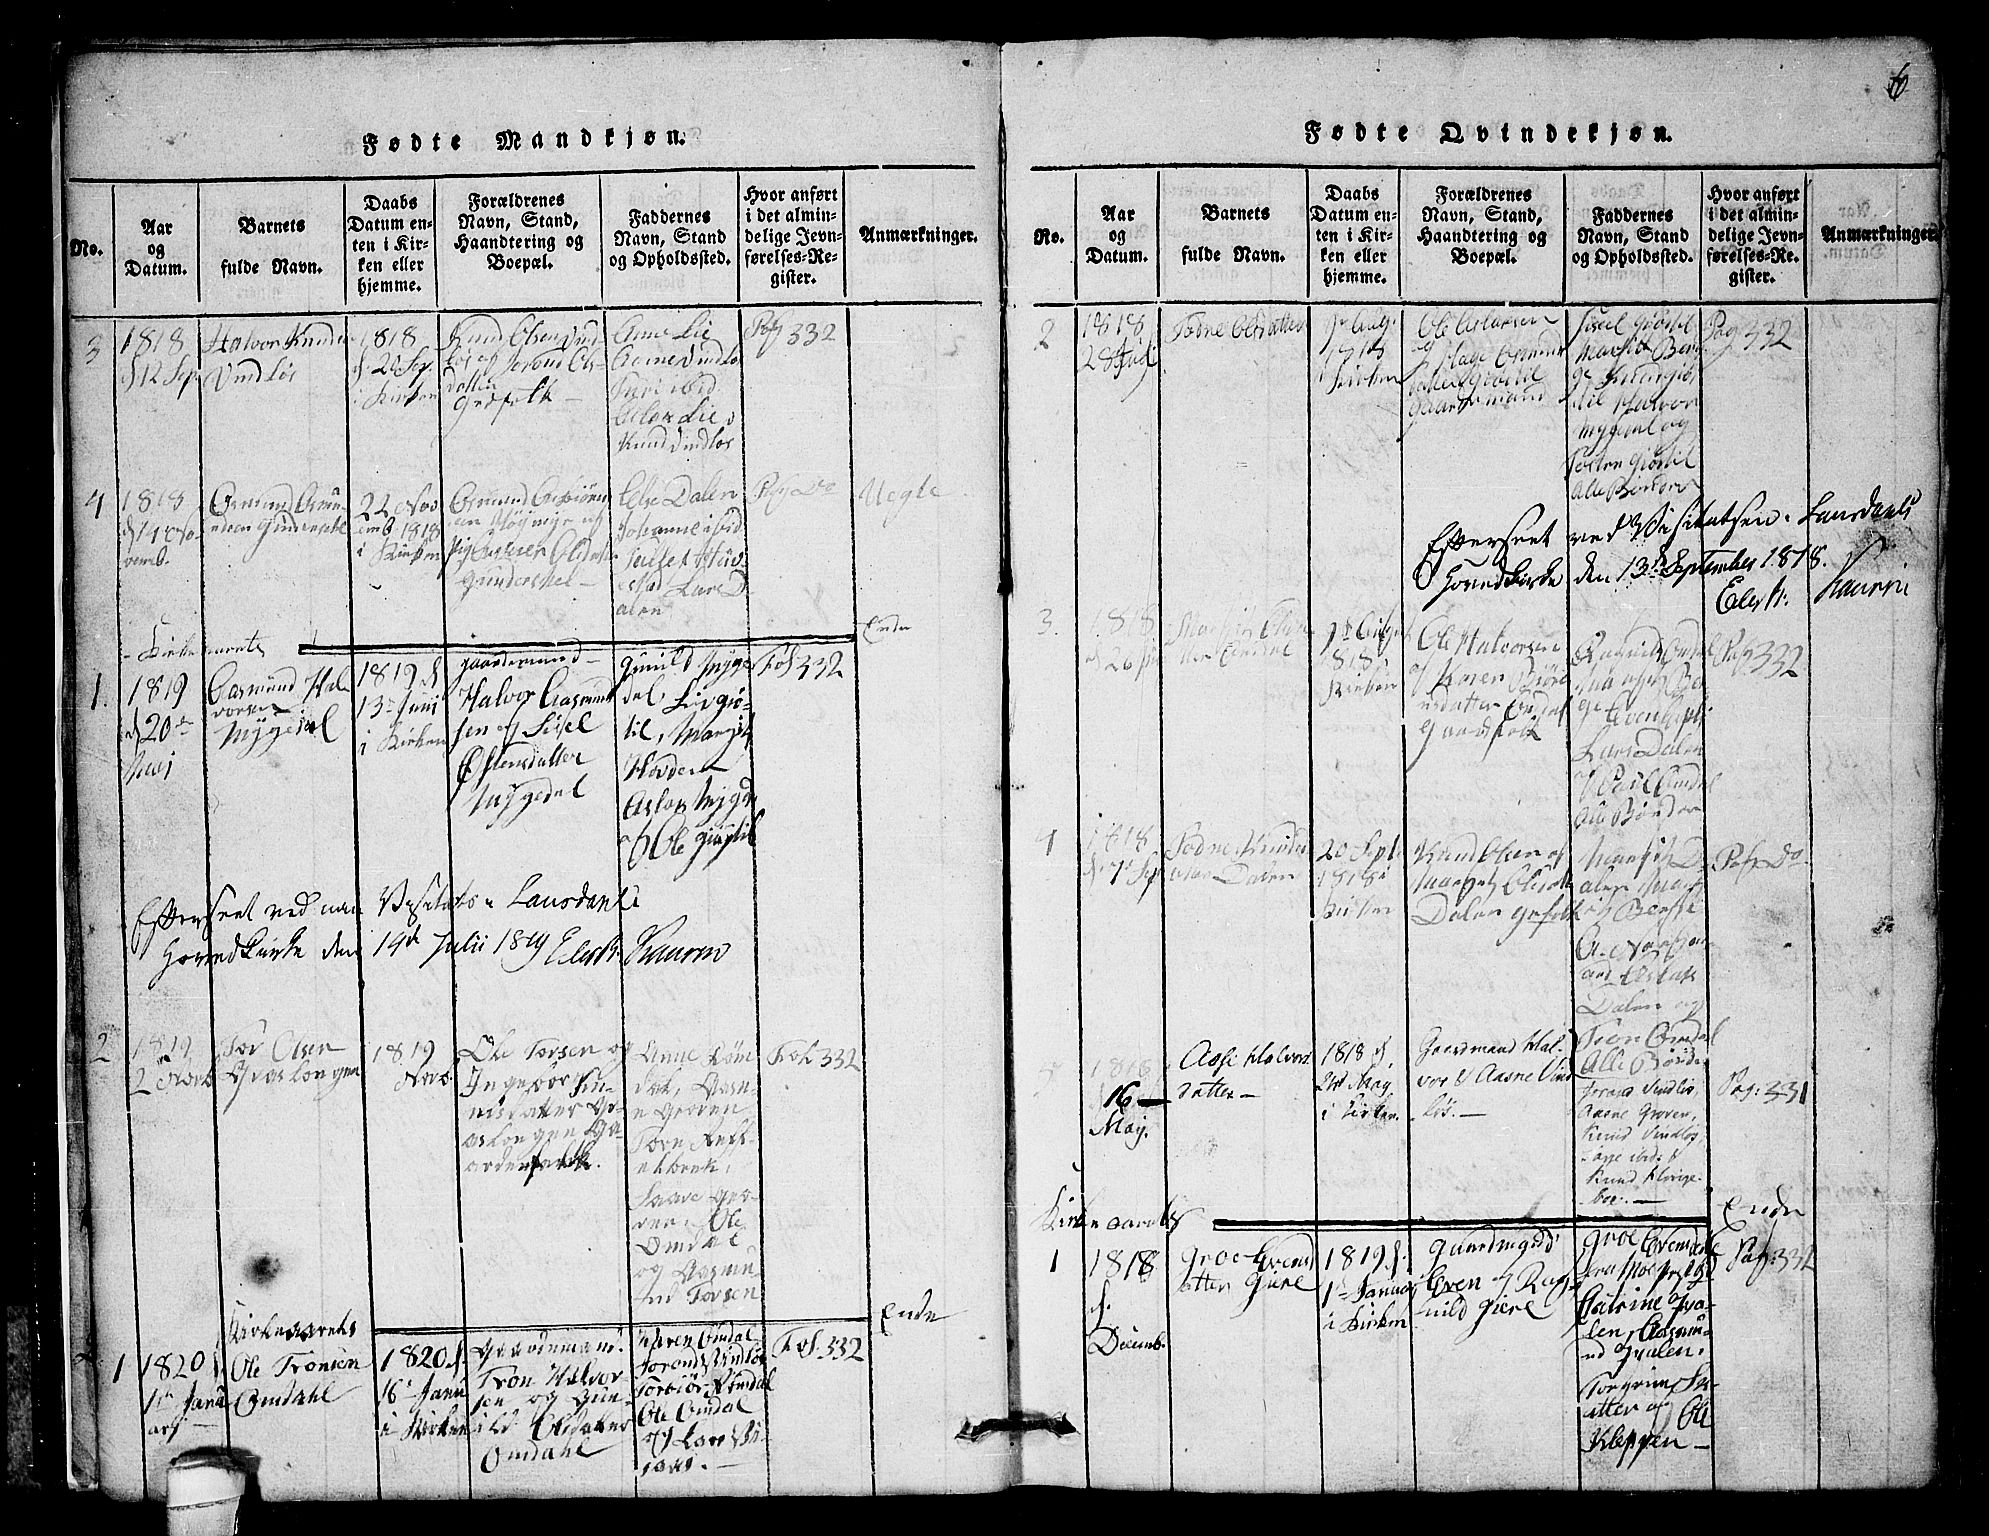 SAKO, Lårdal kirkebøker, G/Gb/L0001: Klokkerbok nr. II 1, 1815-1865, s. 6